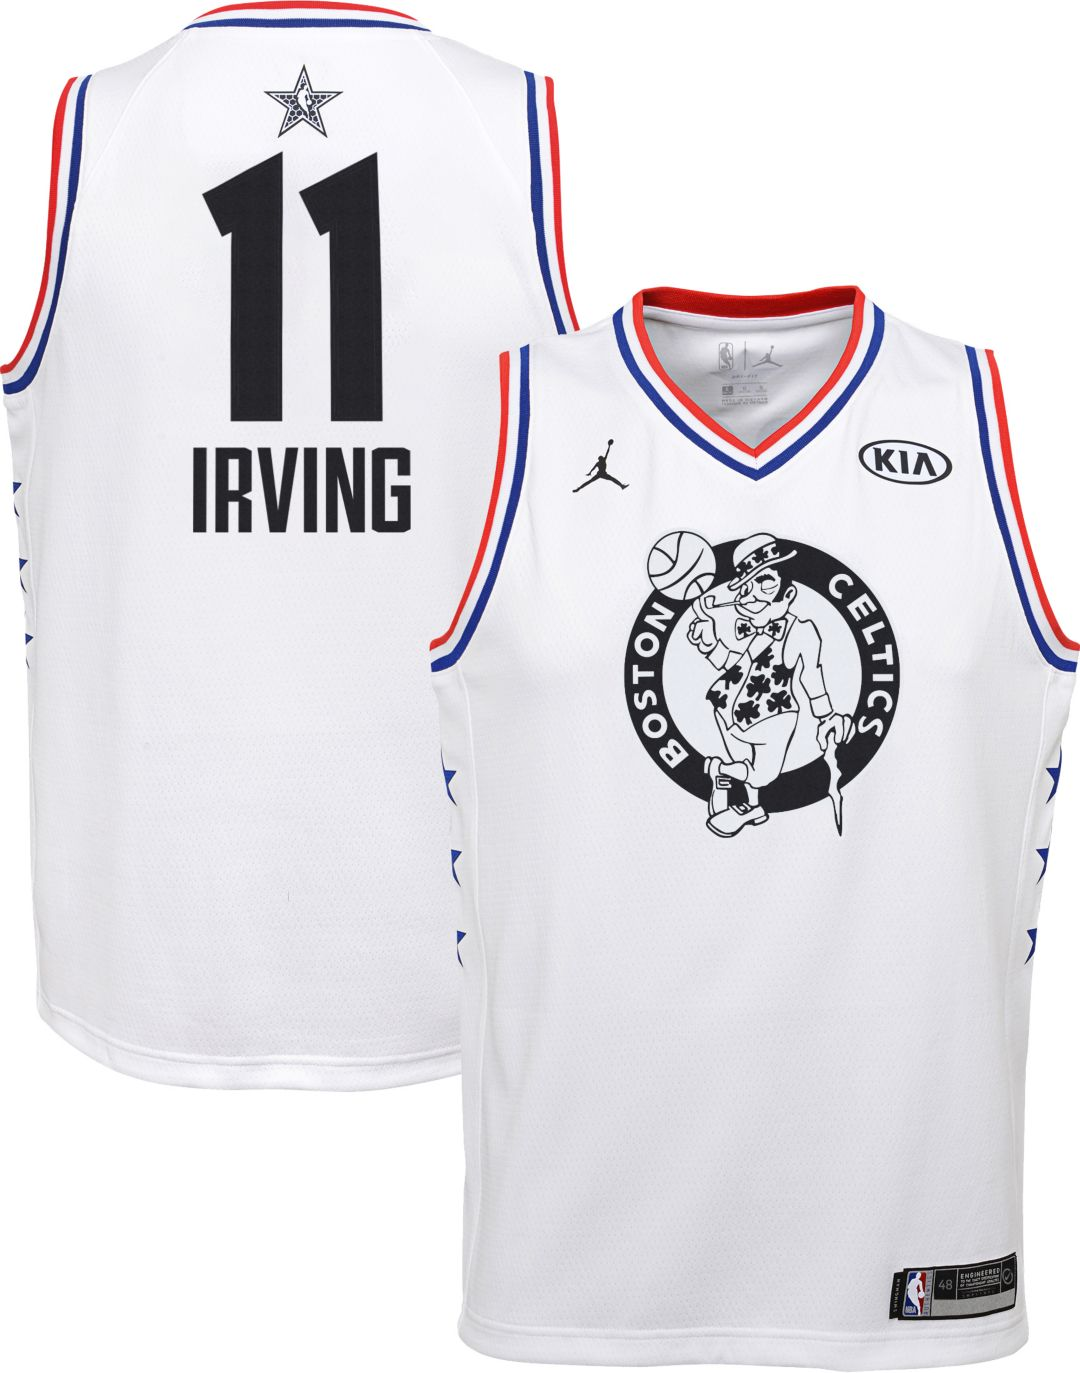 5a8d88f46 Jordan Youth 2019 NBA All-Star Game Kyrie Irving White Dri-FIT Swingman  Jersey